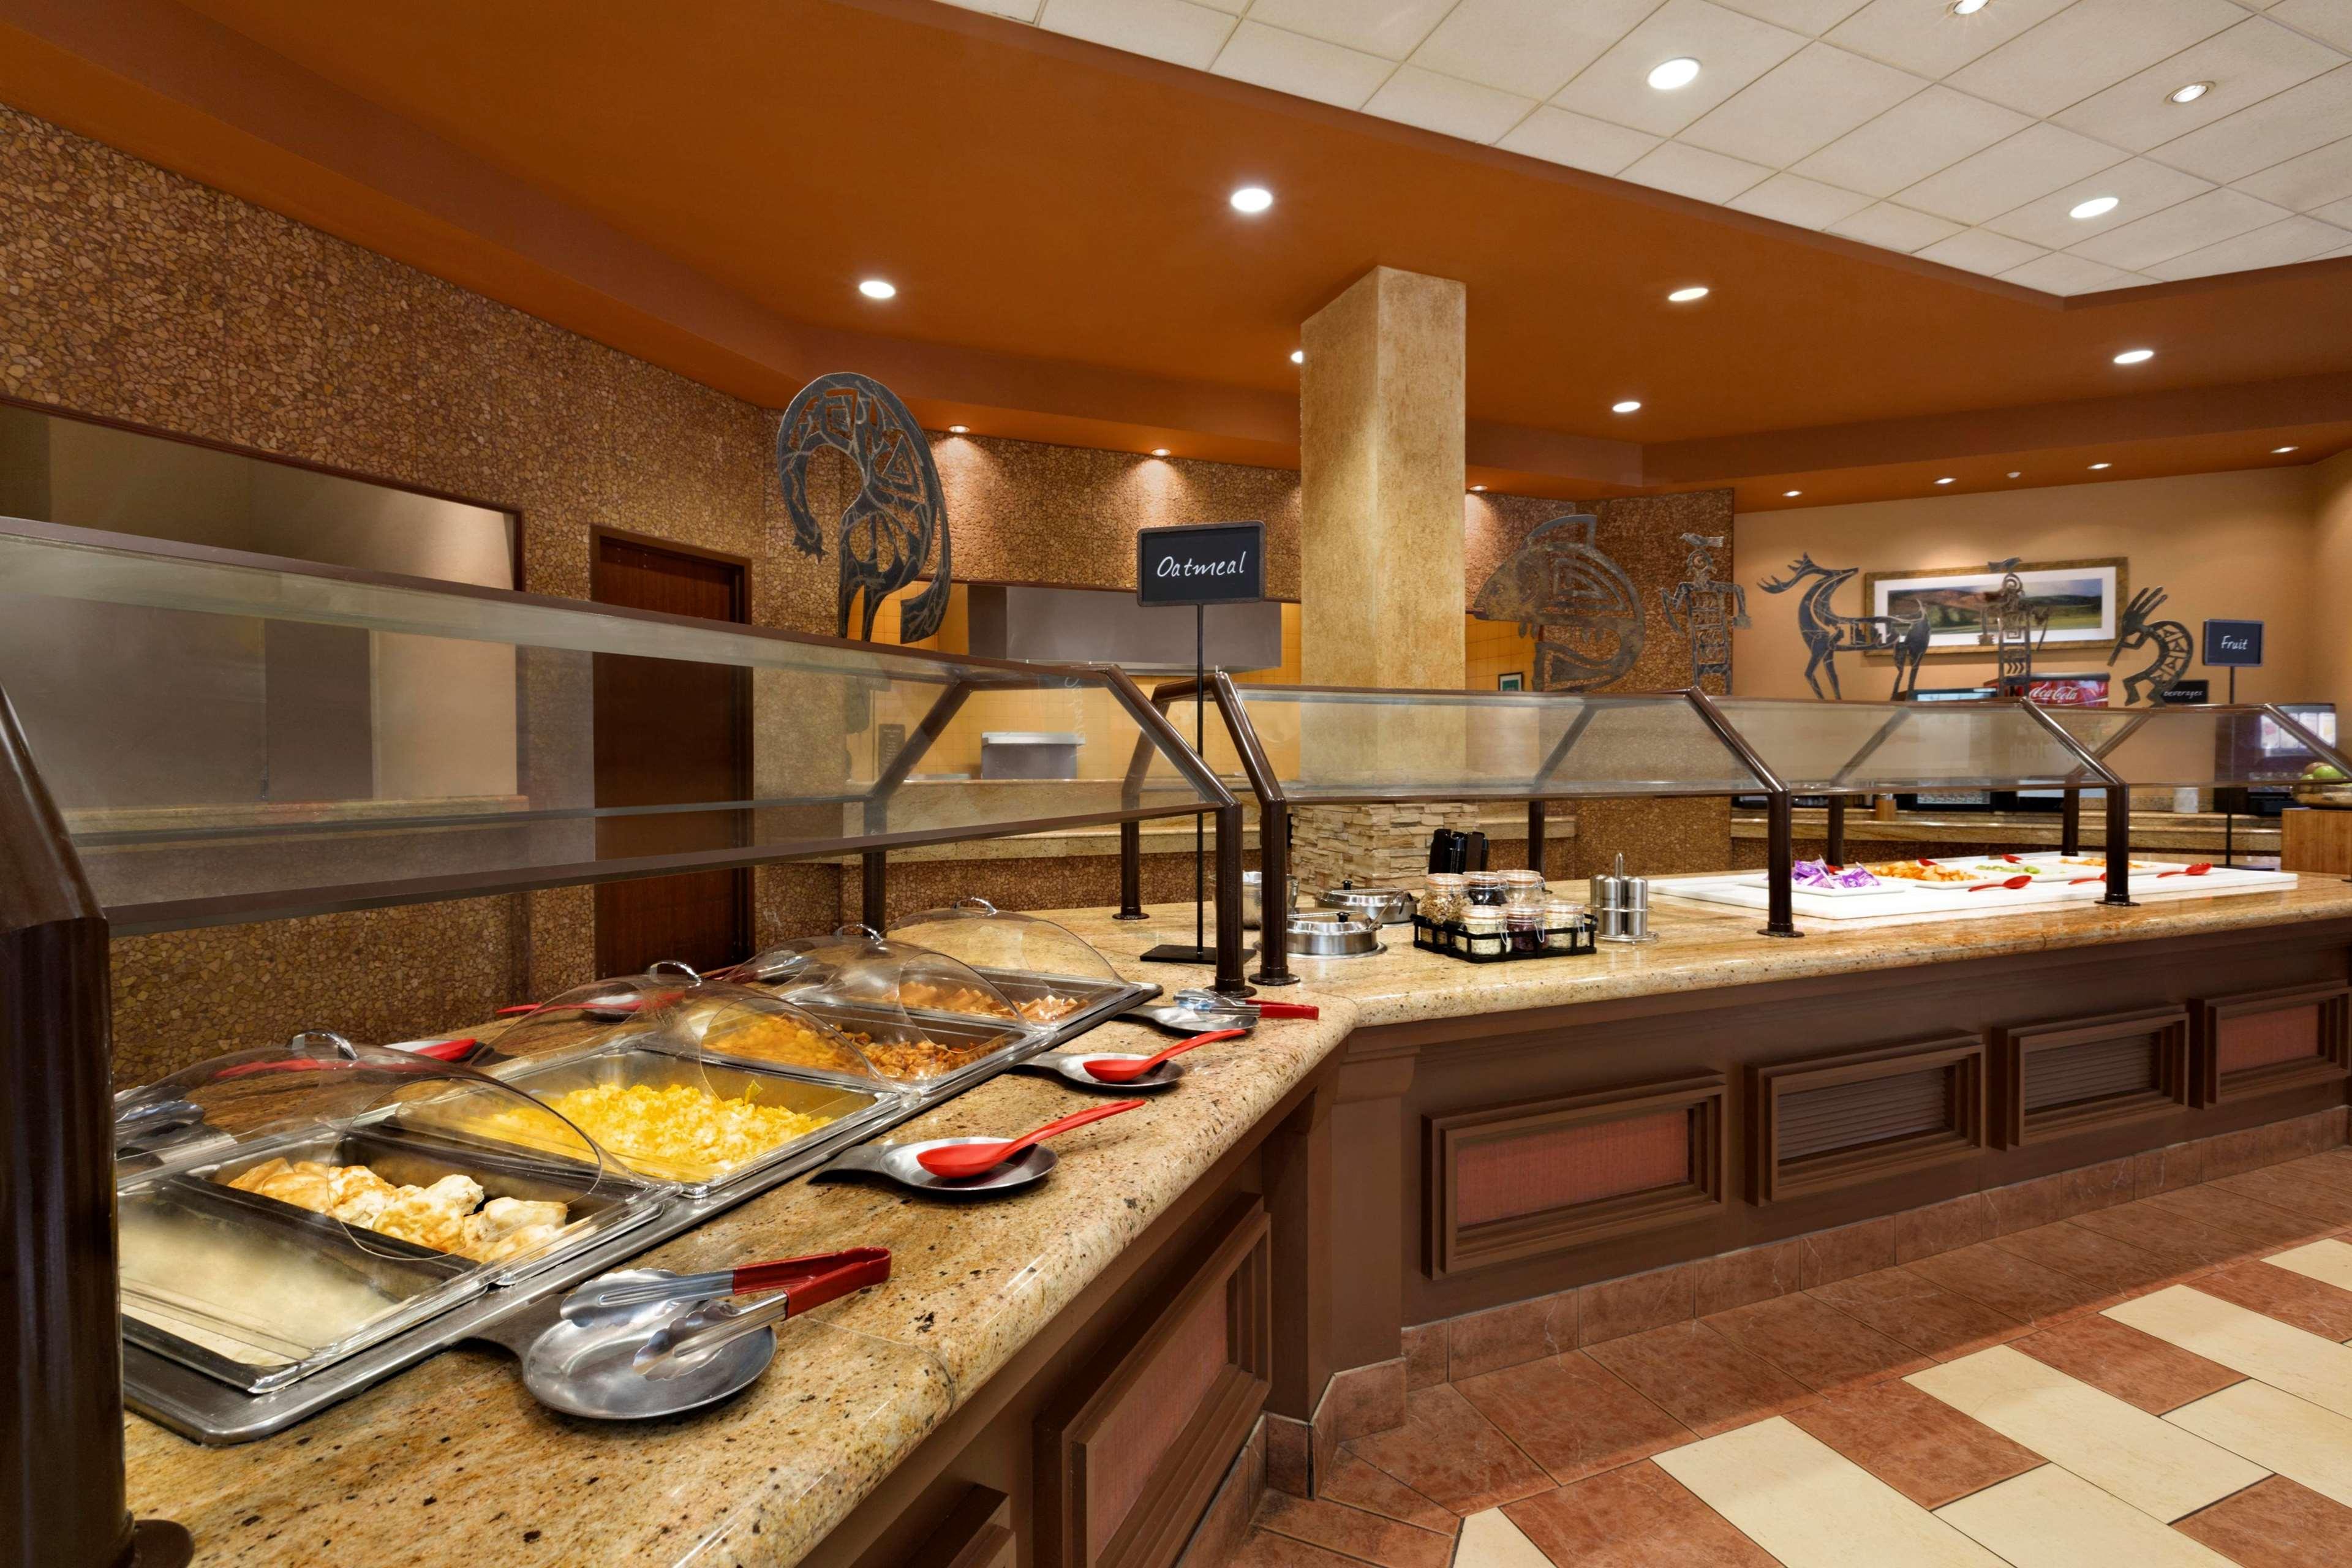 Embassy Suites by Hilton Albuquerque Hotel & Spa image 40